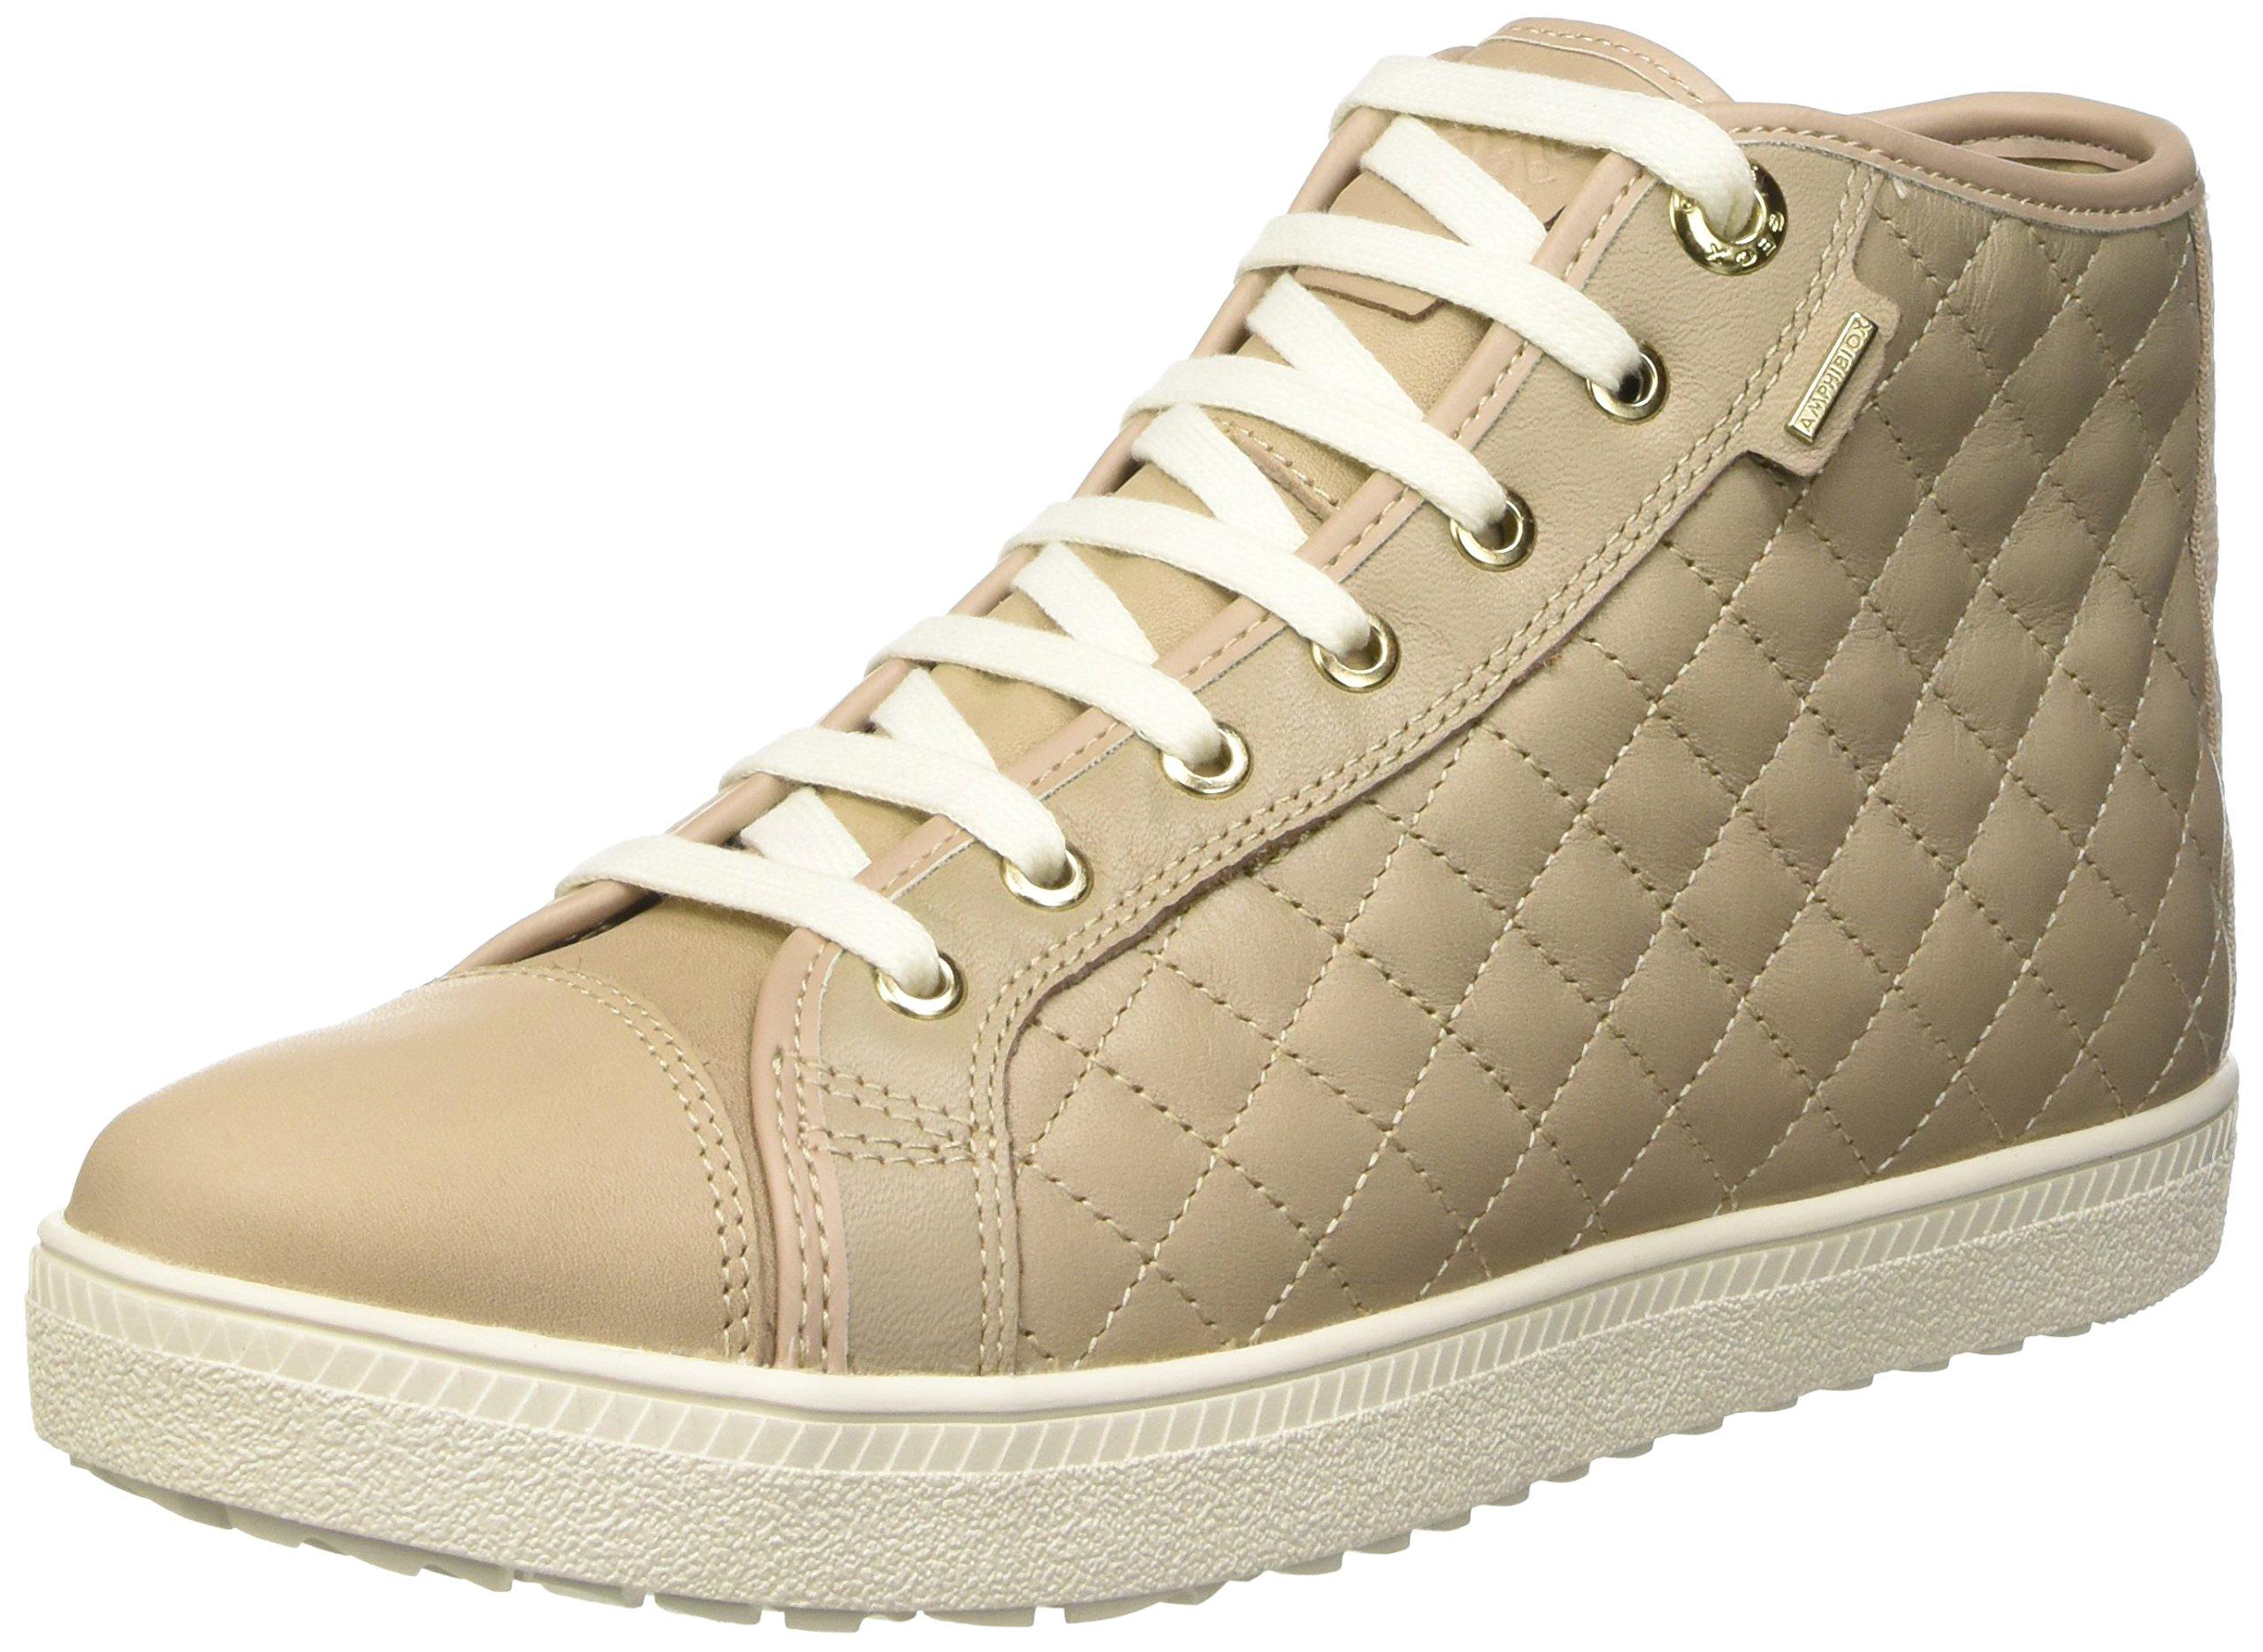 Eu Amaranth B Abx Geox ASneakers FemmeBeigec673836 D Hautes tshrCQd